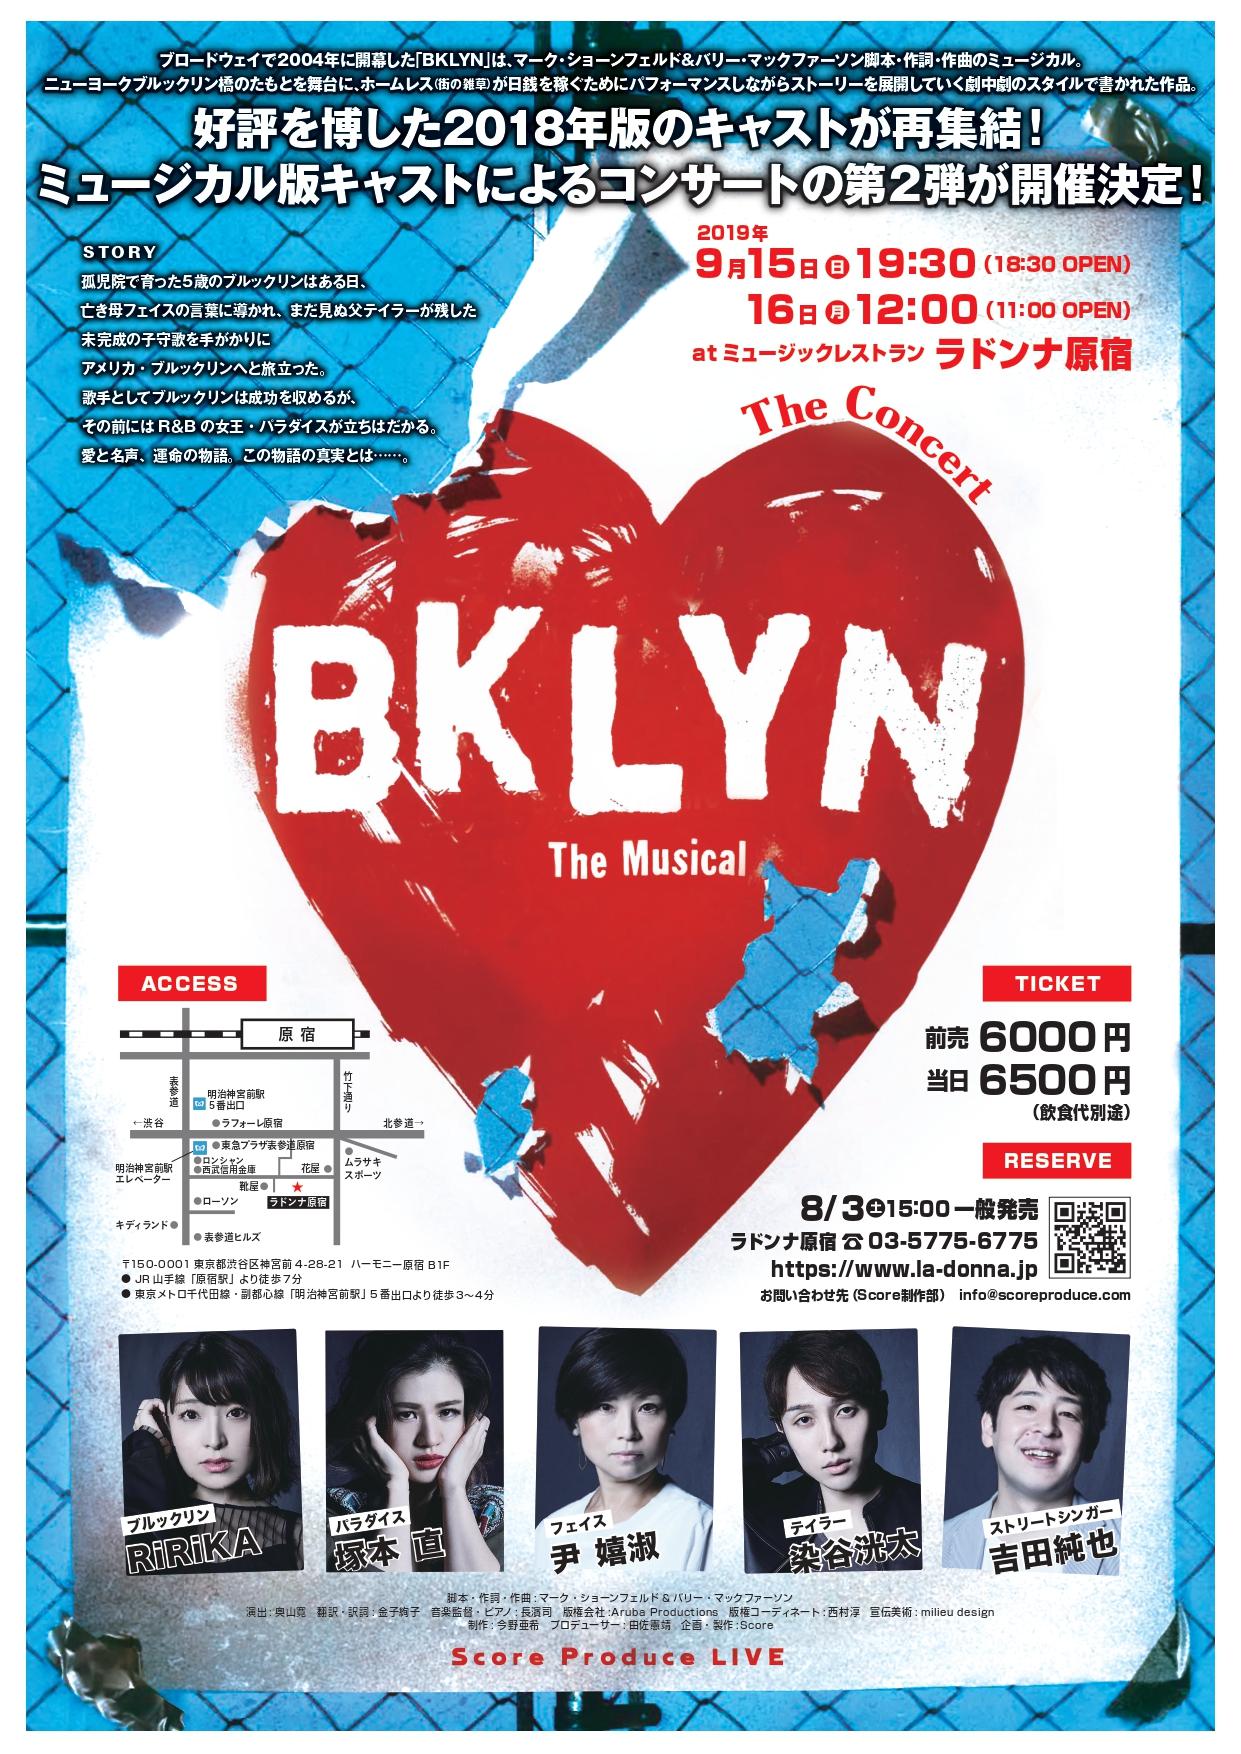 THE MUSICAL -BKLYN CONCERT